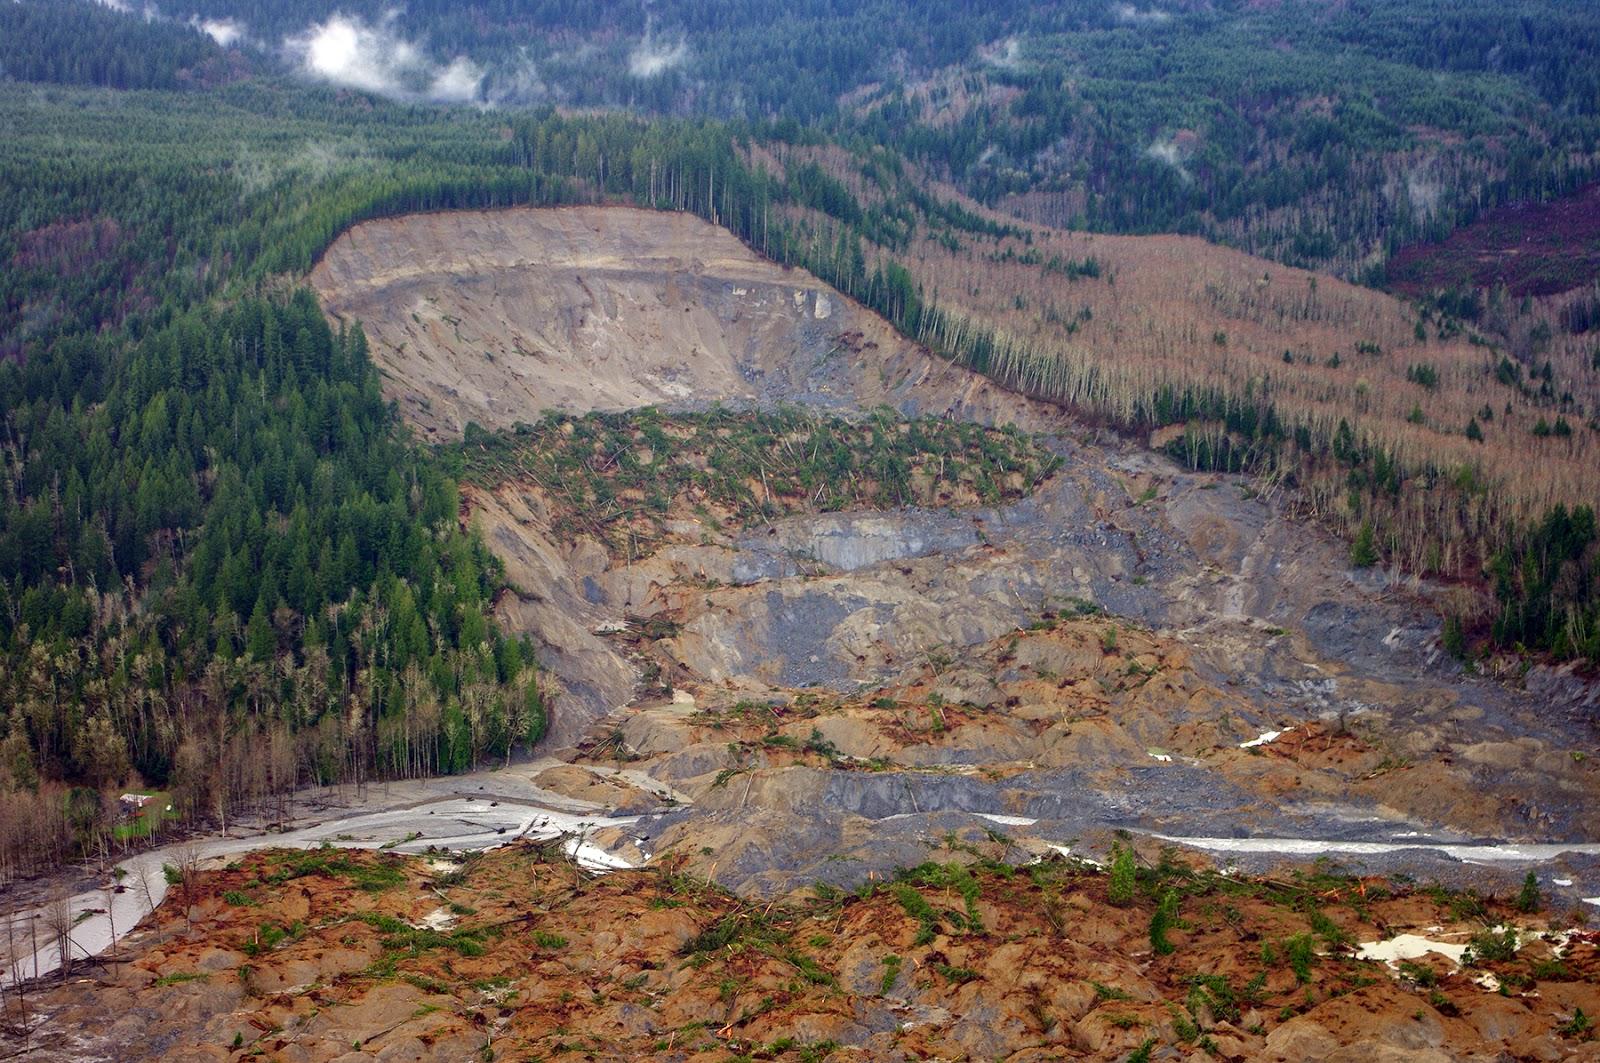 Geog100 2 Landforms And Environmental Hazards